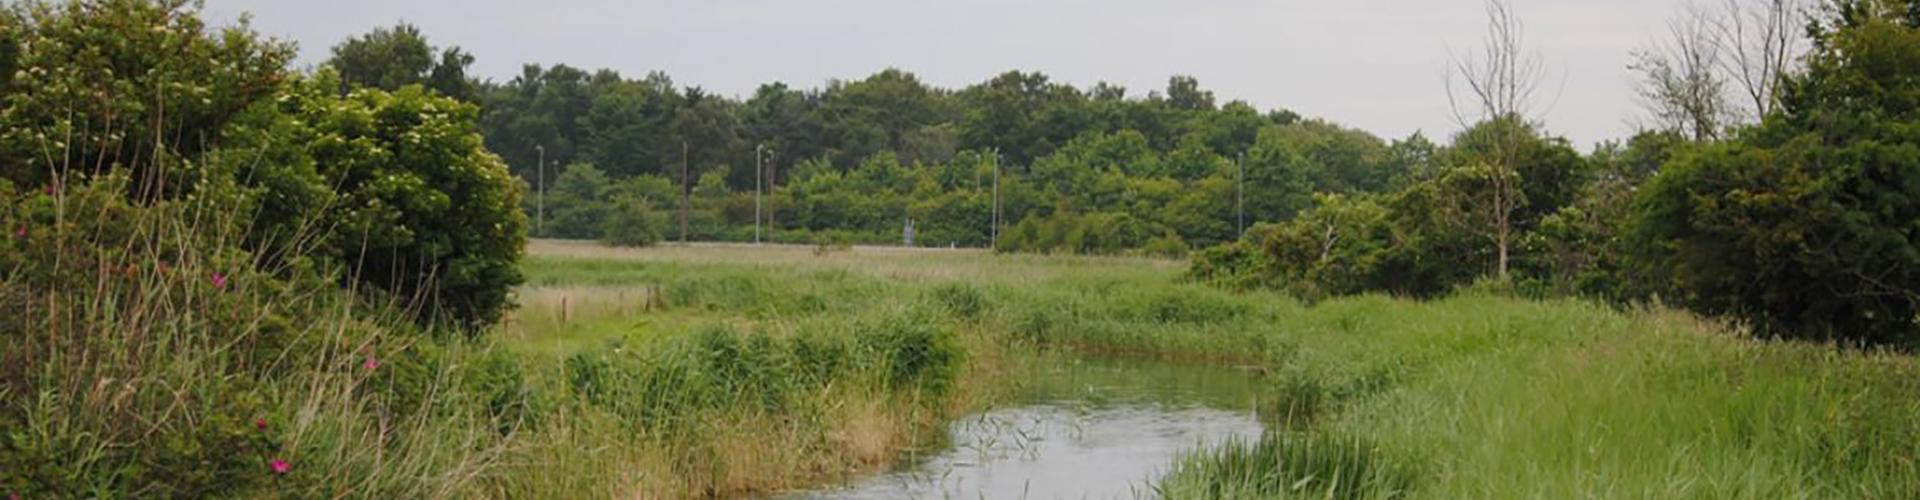 landsbyer-banner